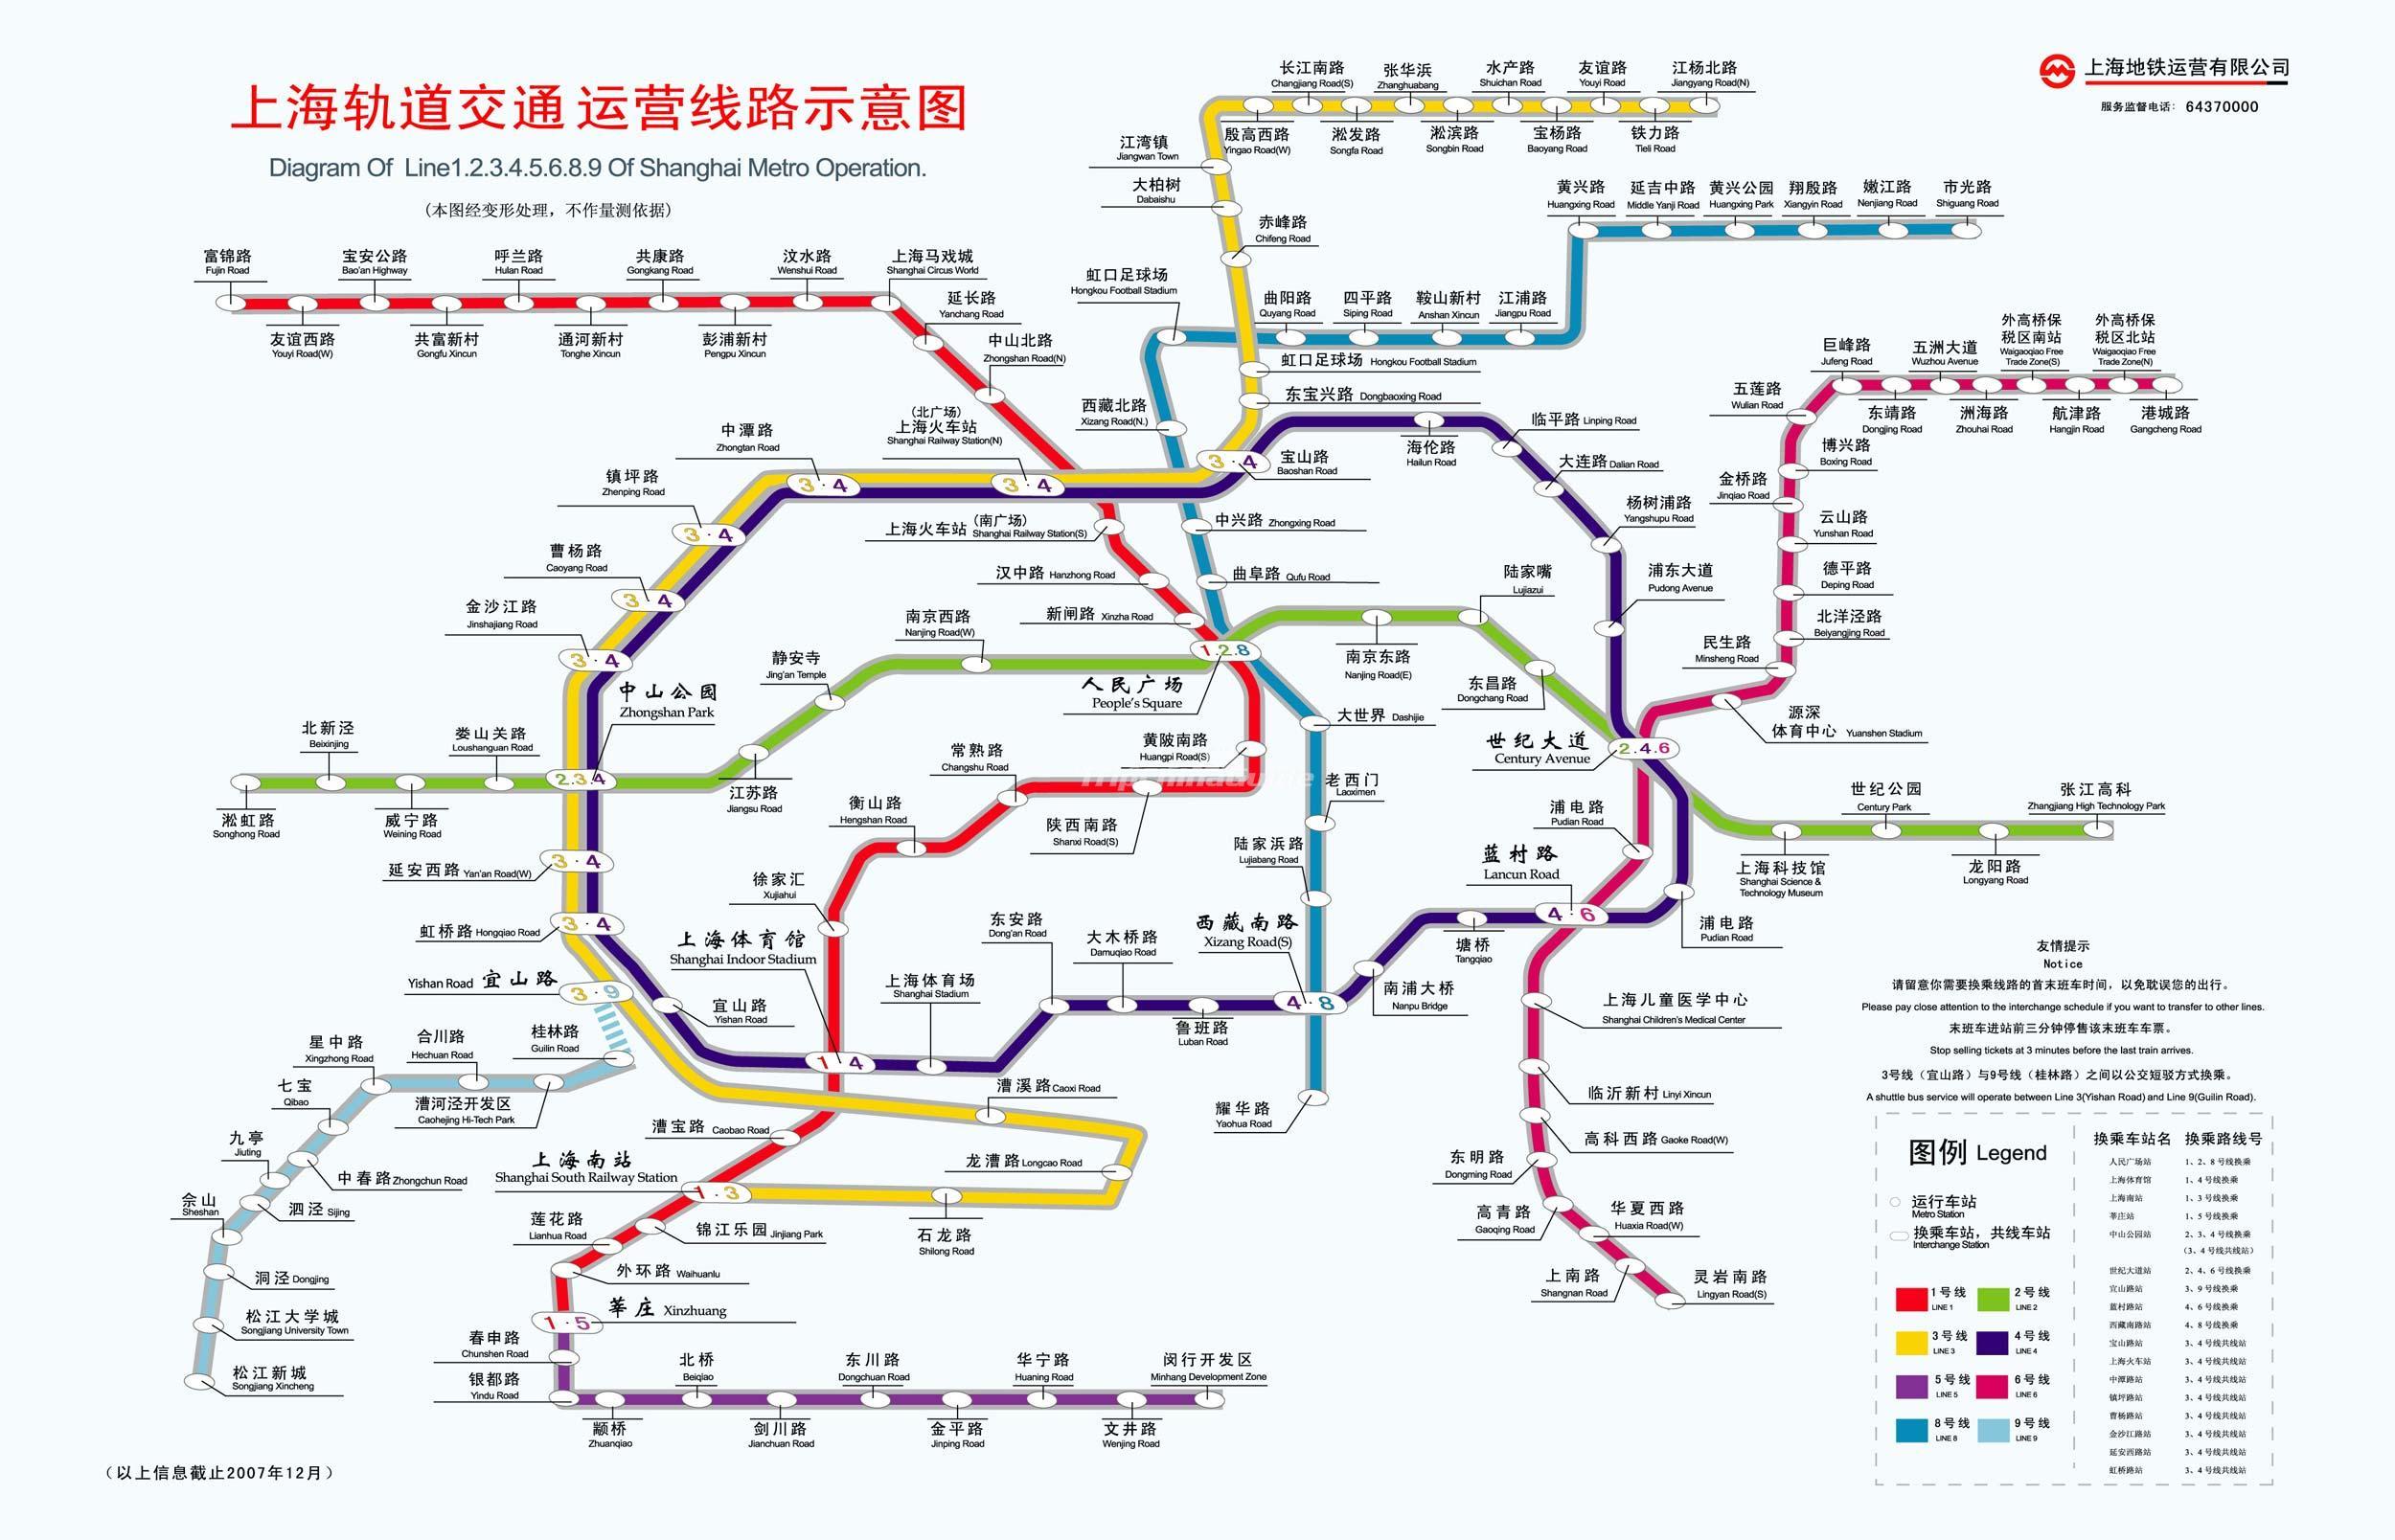 Shanghai Metro Map - Maps of Shanghai on map of montreal metro, map of hamburg metro, map of prague metro, map of panama city metro, map of metro rail, map of washington metro, map of zhengzhou metro, map of london metro, map of dubai metro, map of moscow metro, map of barcelona metro, map of houston metro, map of suzhou metro, map of chicago metro, map of rome metro, map of nanjing metro, map of dublin metro, map of shenzhen metro, map of copenhagen metro, map of brussels metro,